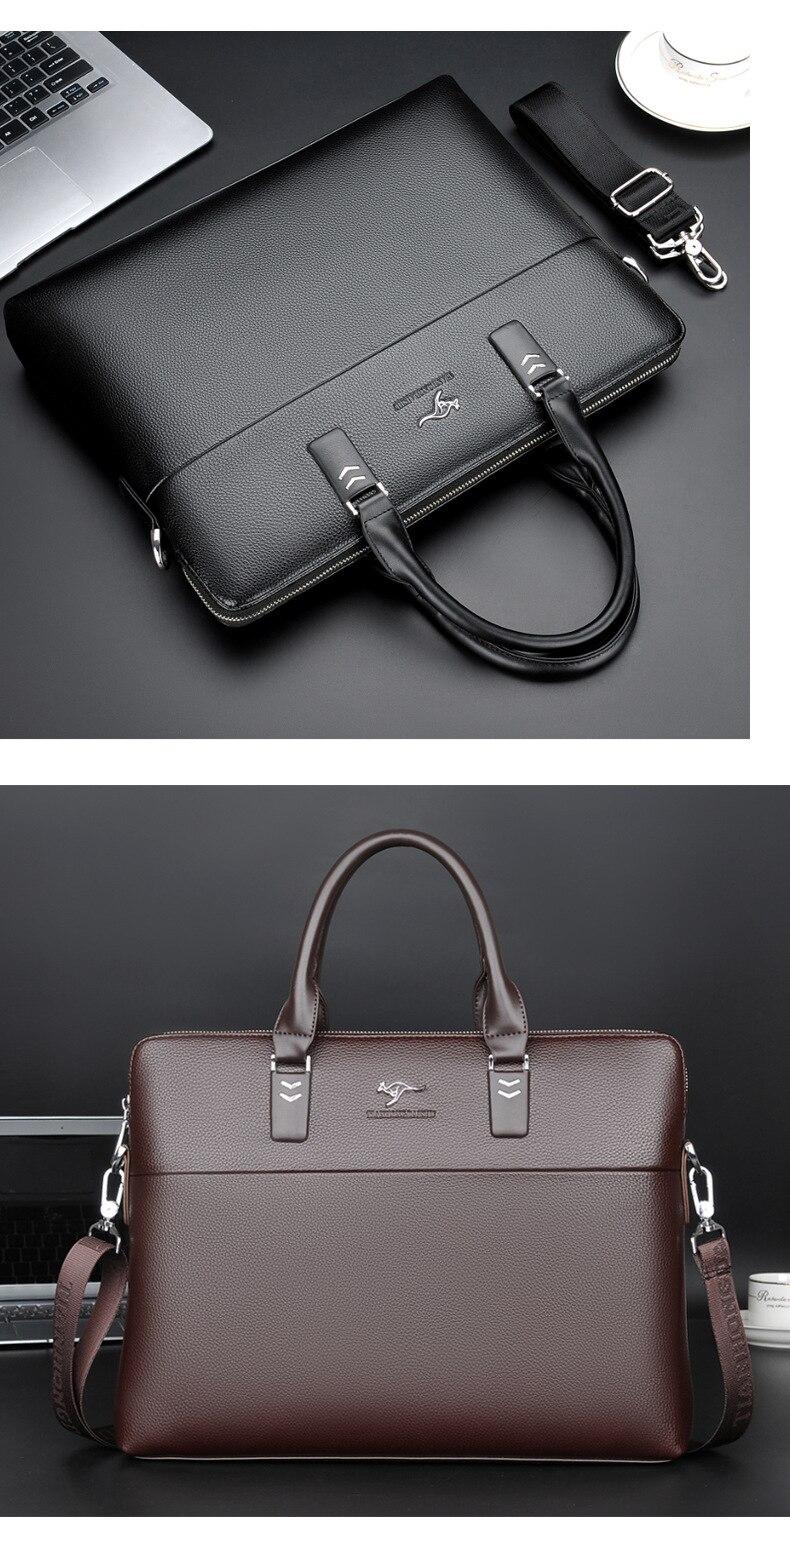 HTB1f7P6f.FWMKJjSZFvq6yenFXah TIANHONGDAISHU Men Casual Briefcase Business Shoulder Leather Messenger Bags Computer Laptop Handbag Men's Travel Bags handbags